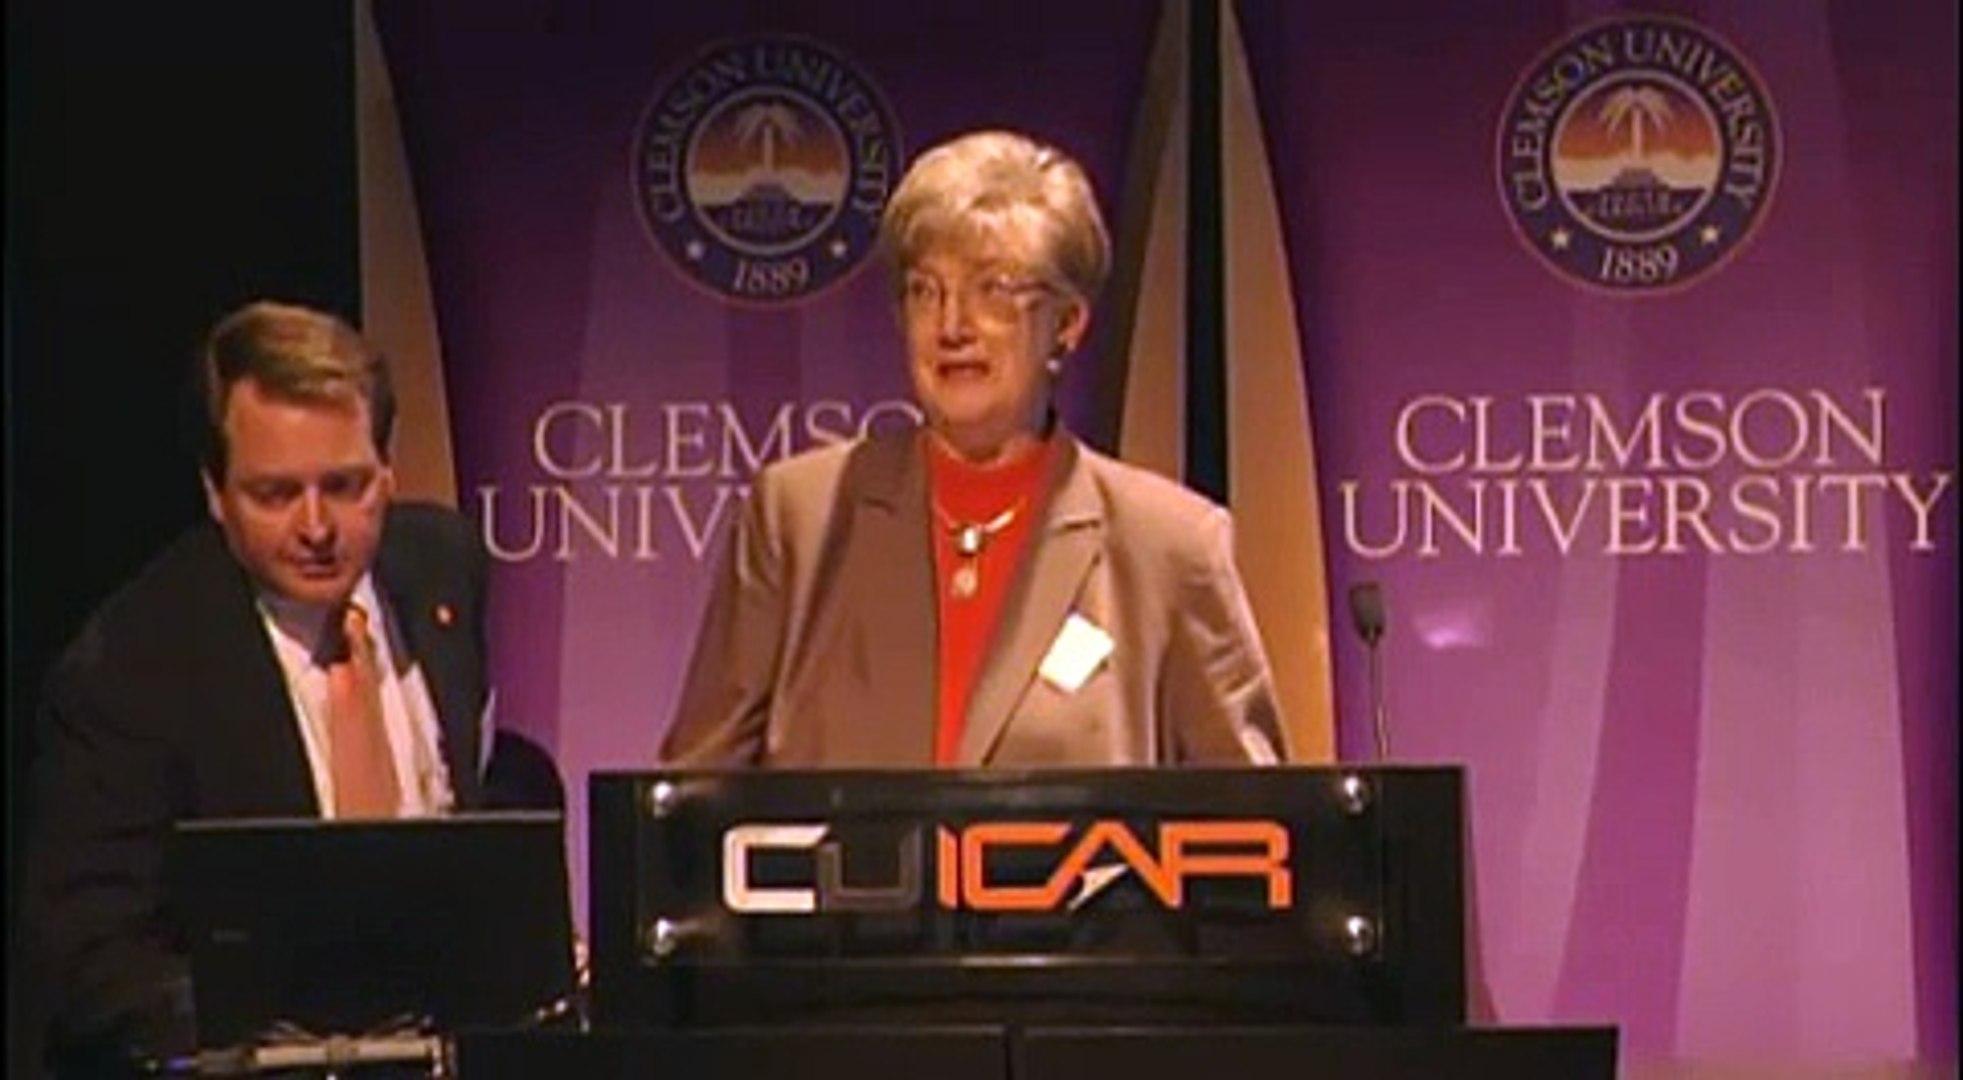 Dori Helms, Ph.D., Vice President for Academic Affairs and Provost, Clemson University